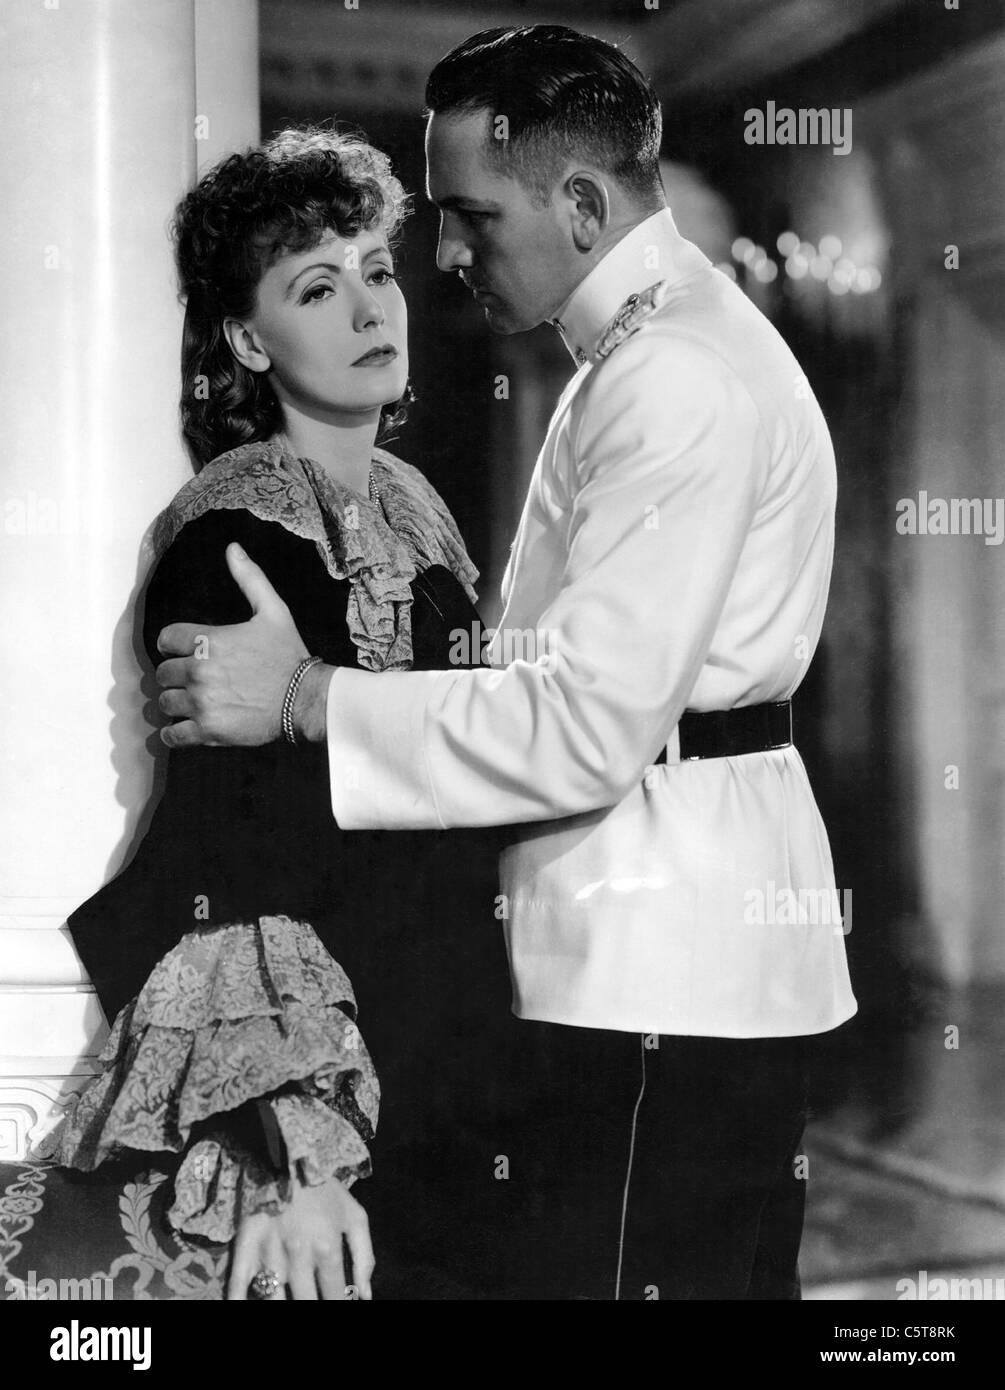 ANNA KARENINA (1935) GRETA GARBO, FREDDIE BARTHOLOMEW CLARENCE BROWN (DIR ANKR 014 MOVIESTORE COLLECTION LTD Stock Photo